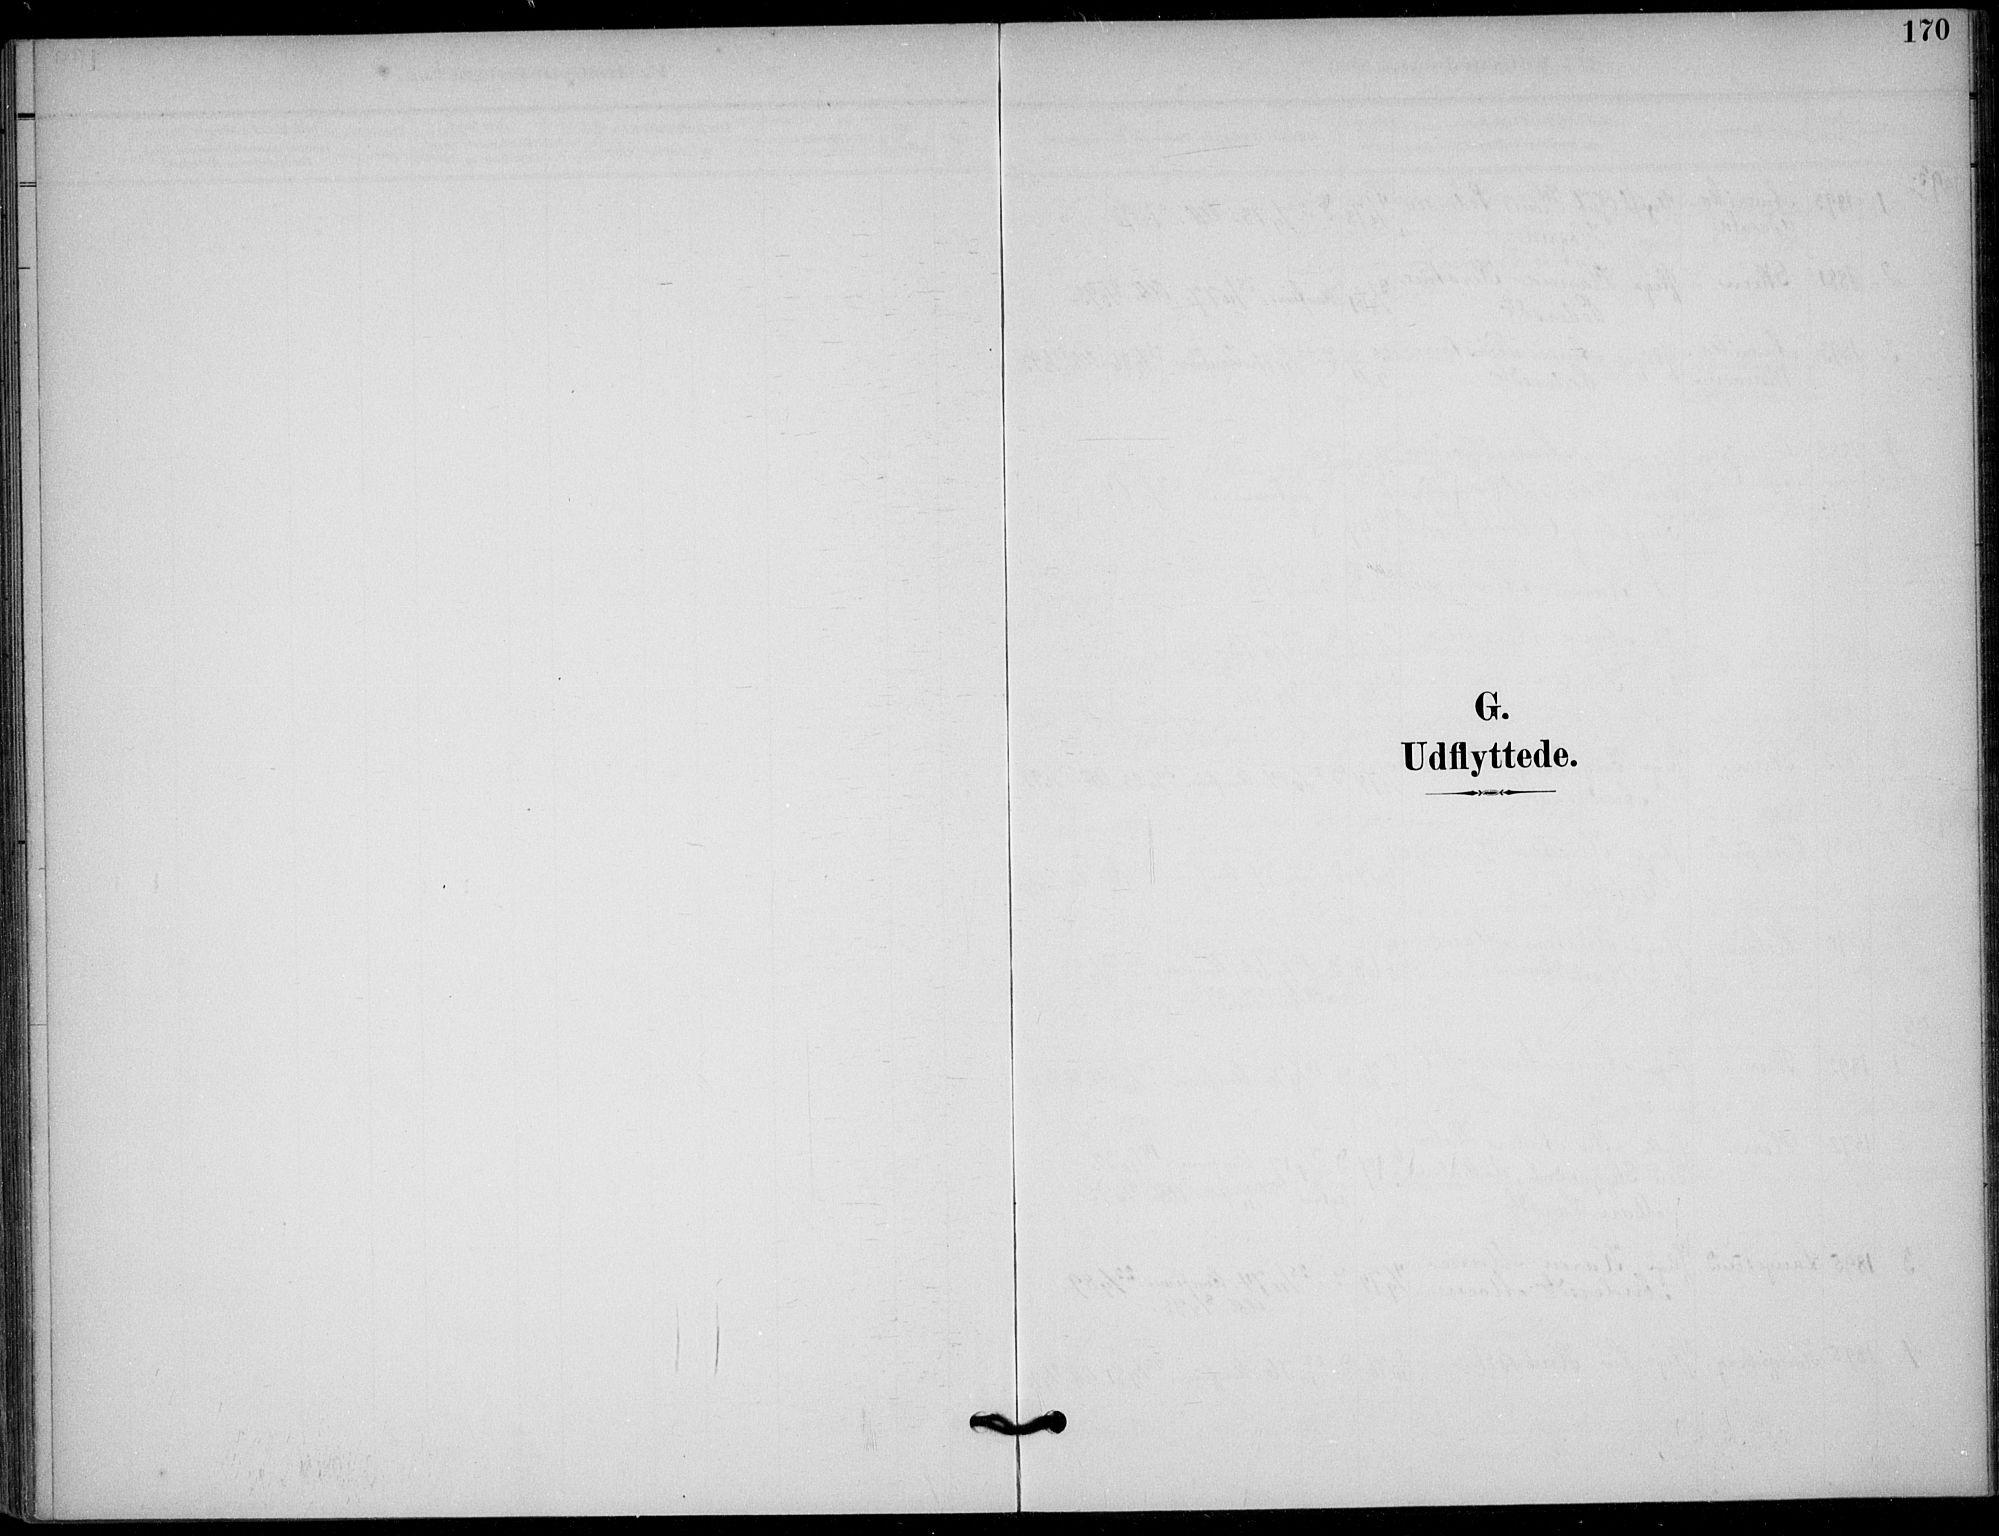 SAKO, Solum kirkebøker, F/Fb/L0002: Ministerialbok nr. II 2, 1893-1901, s. 170